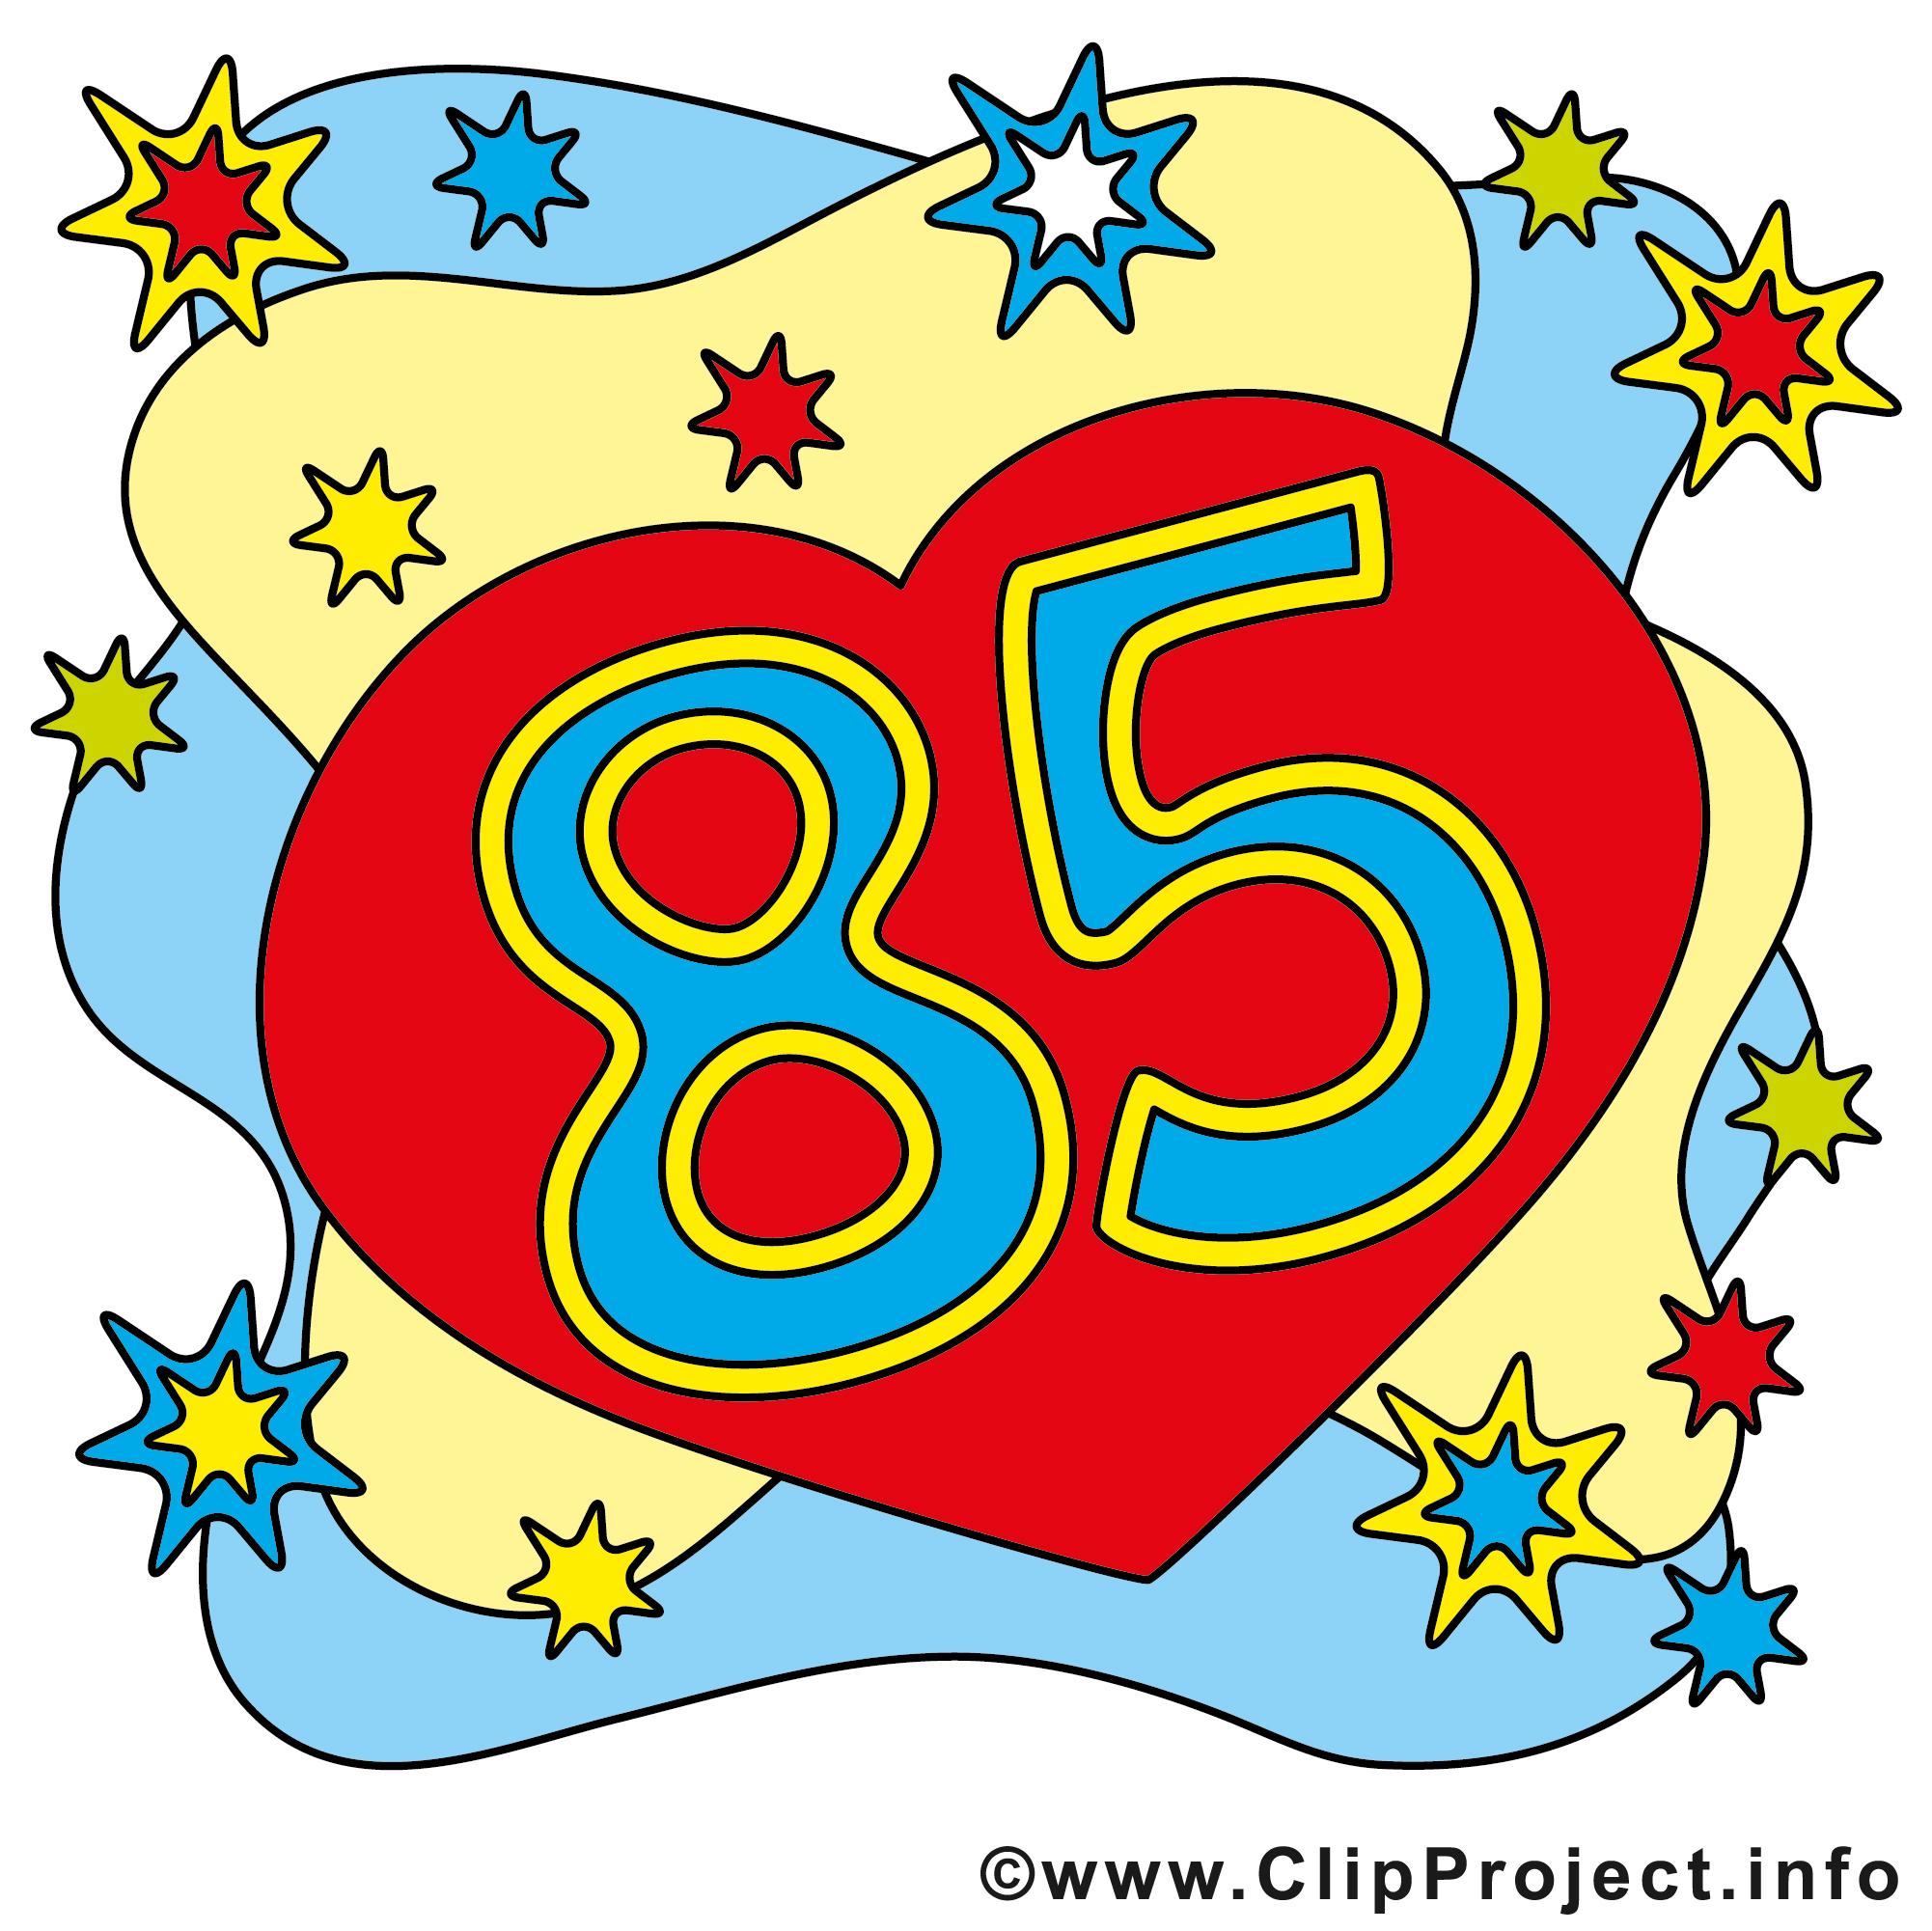 85 clipart banner royalty free 85 Geburtstagskarte gratis banner royalty free